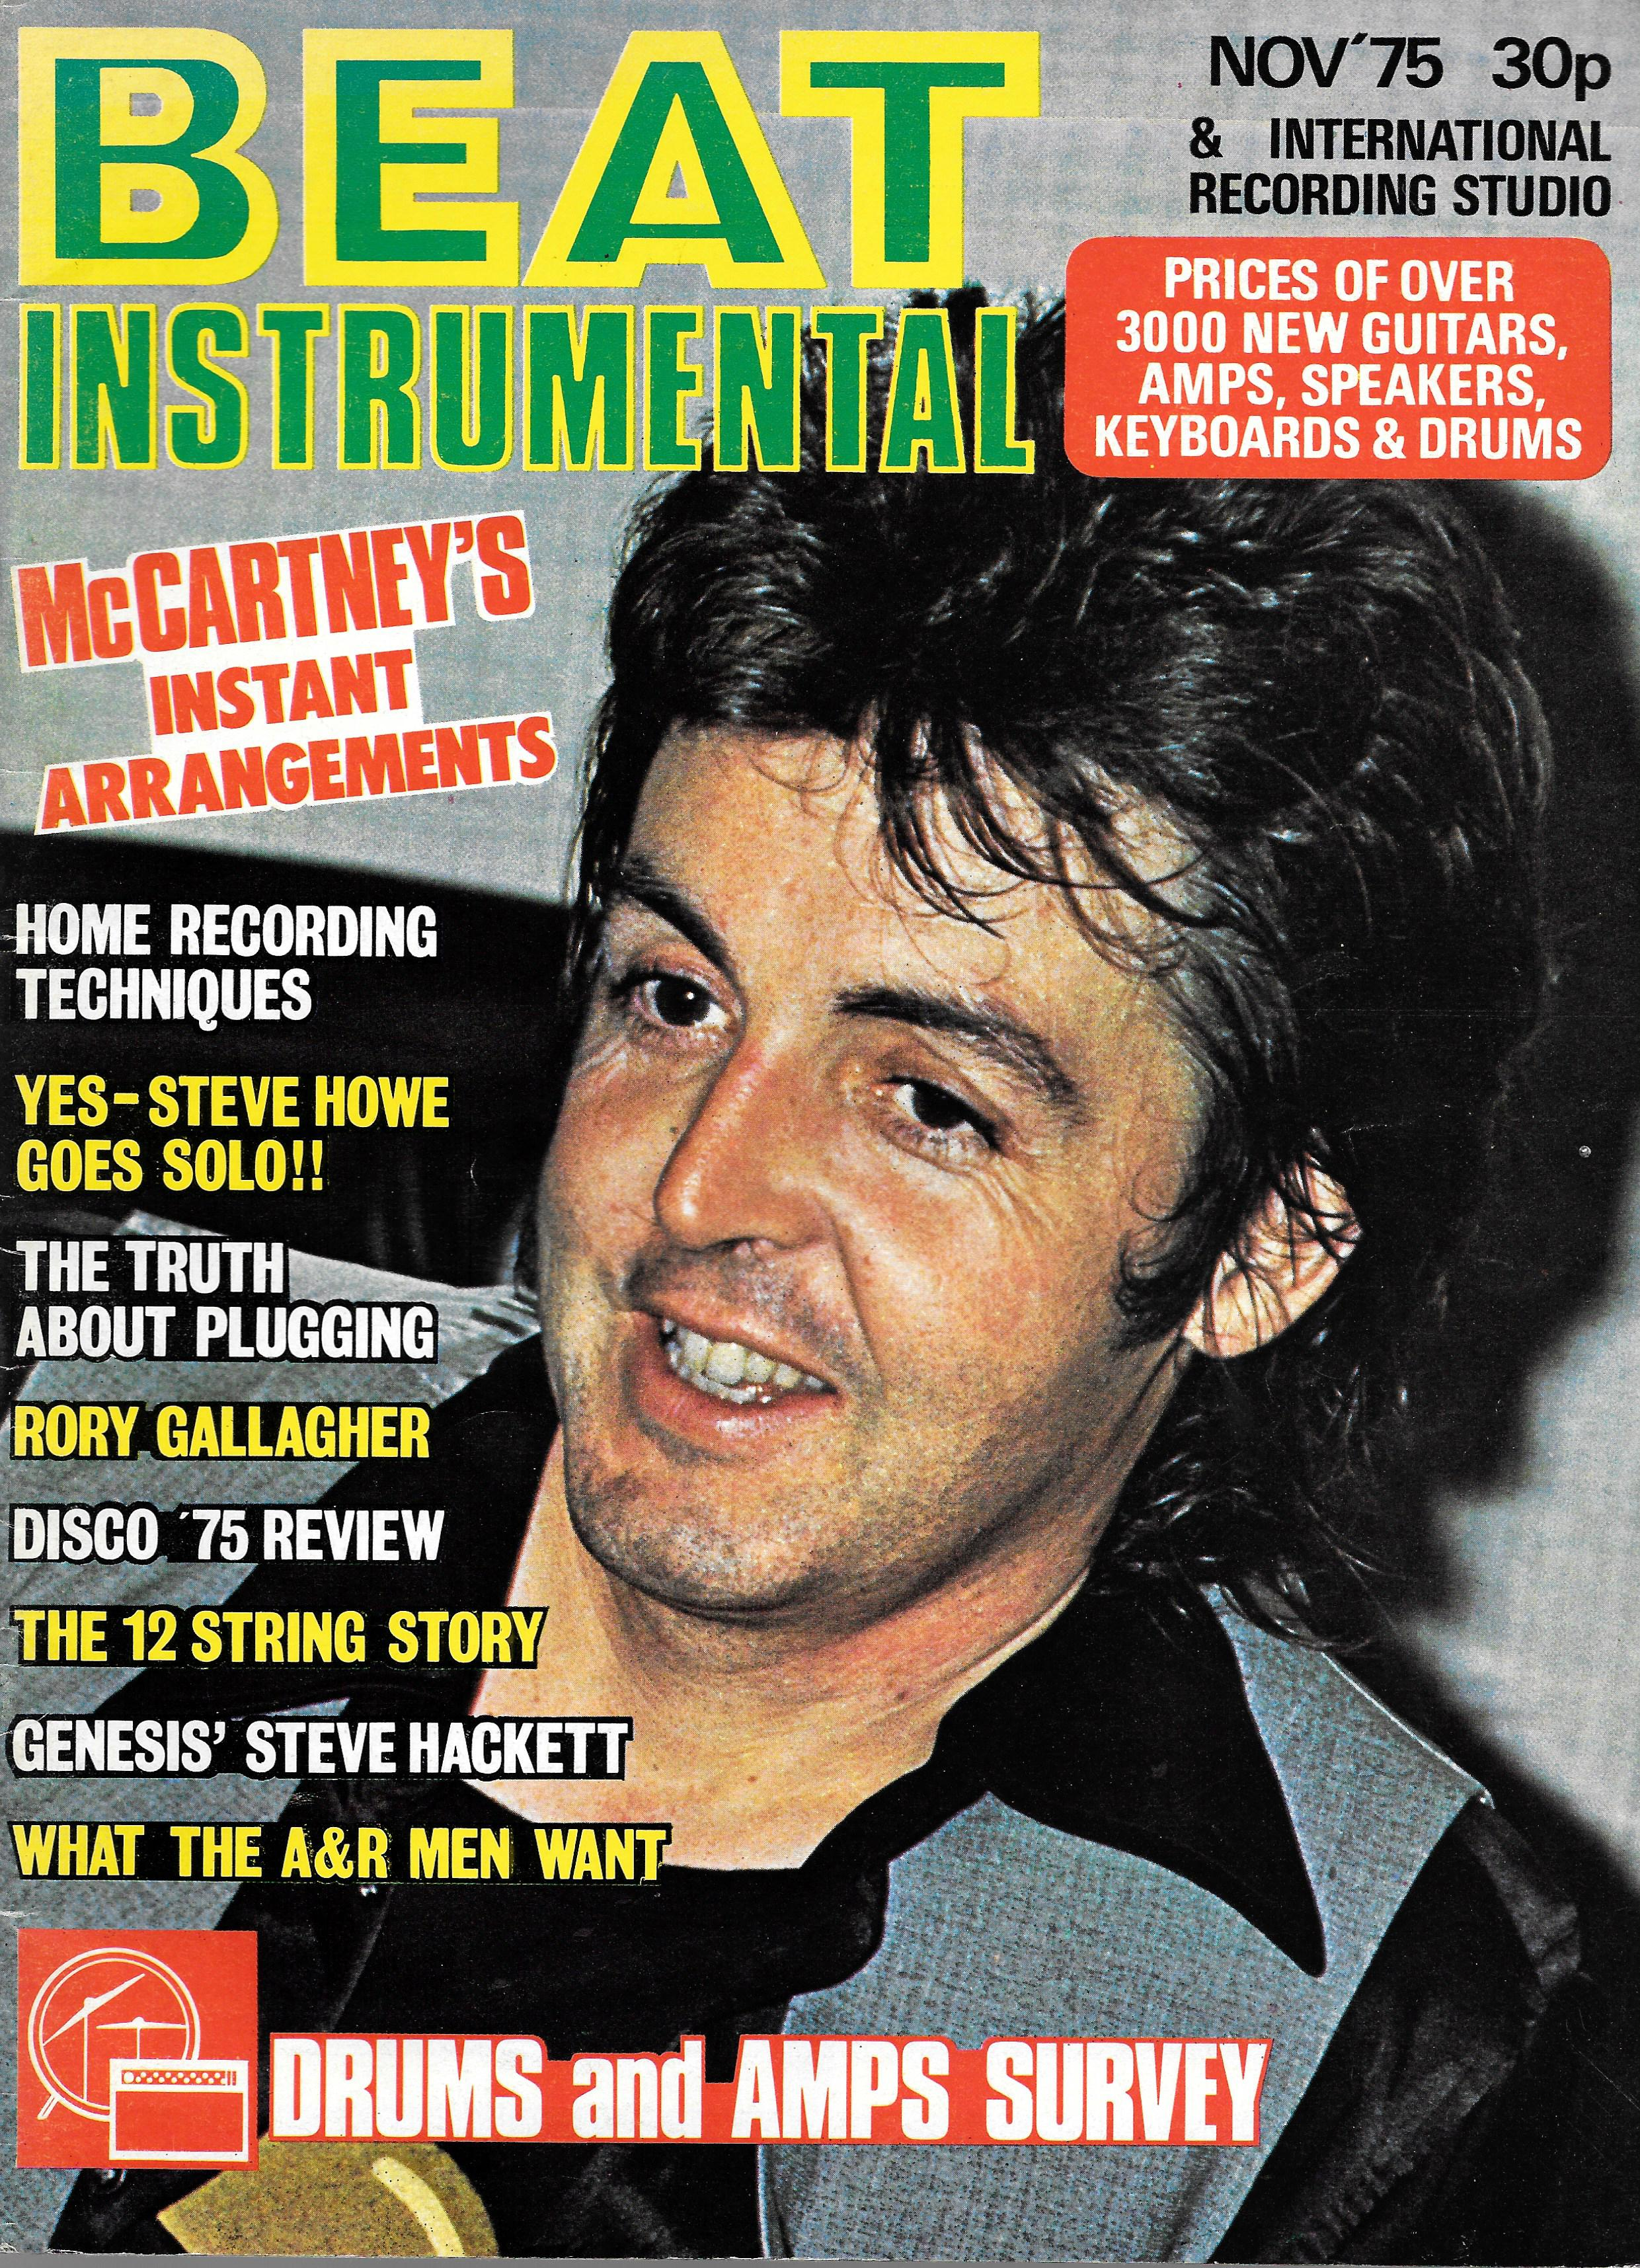 BEAT INSTRUMENTAL UK MAGAZINE NOVEMBER 1975 PAUL MCCARTNEY